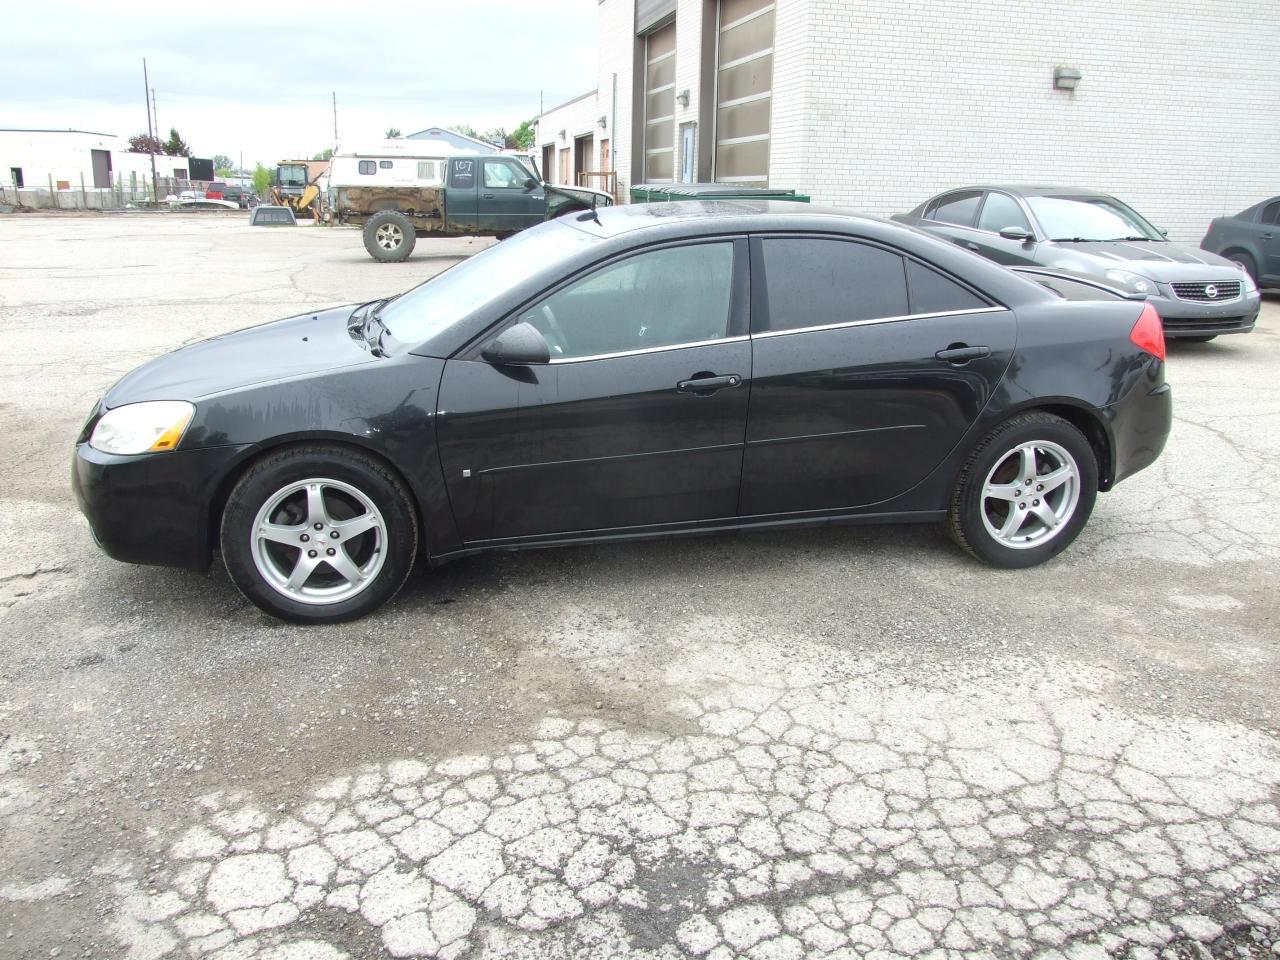 Photo of Black 2009 Pontiac G6